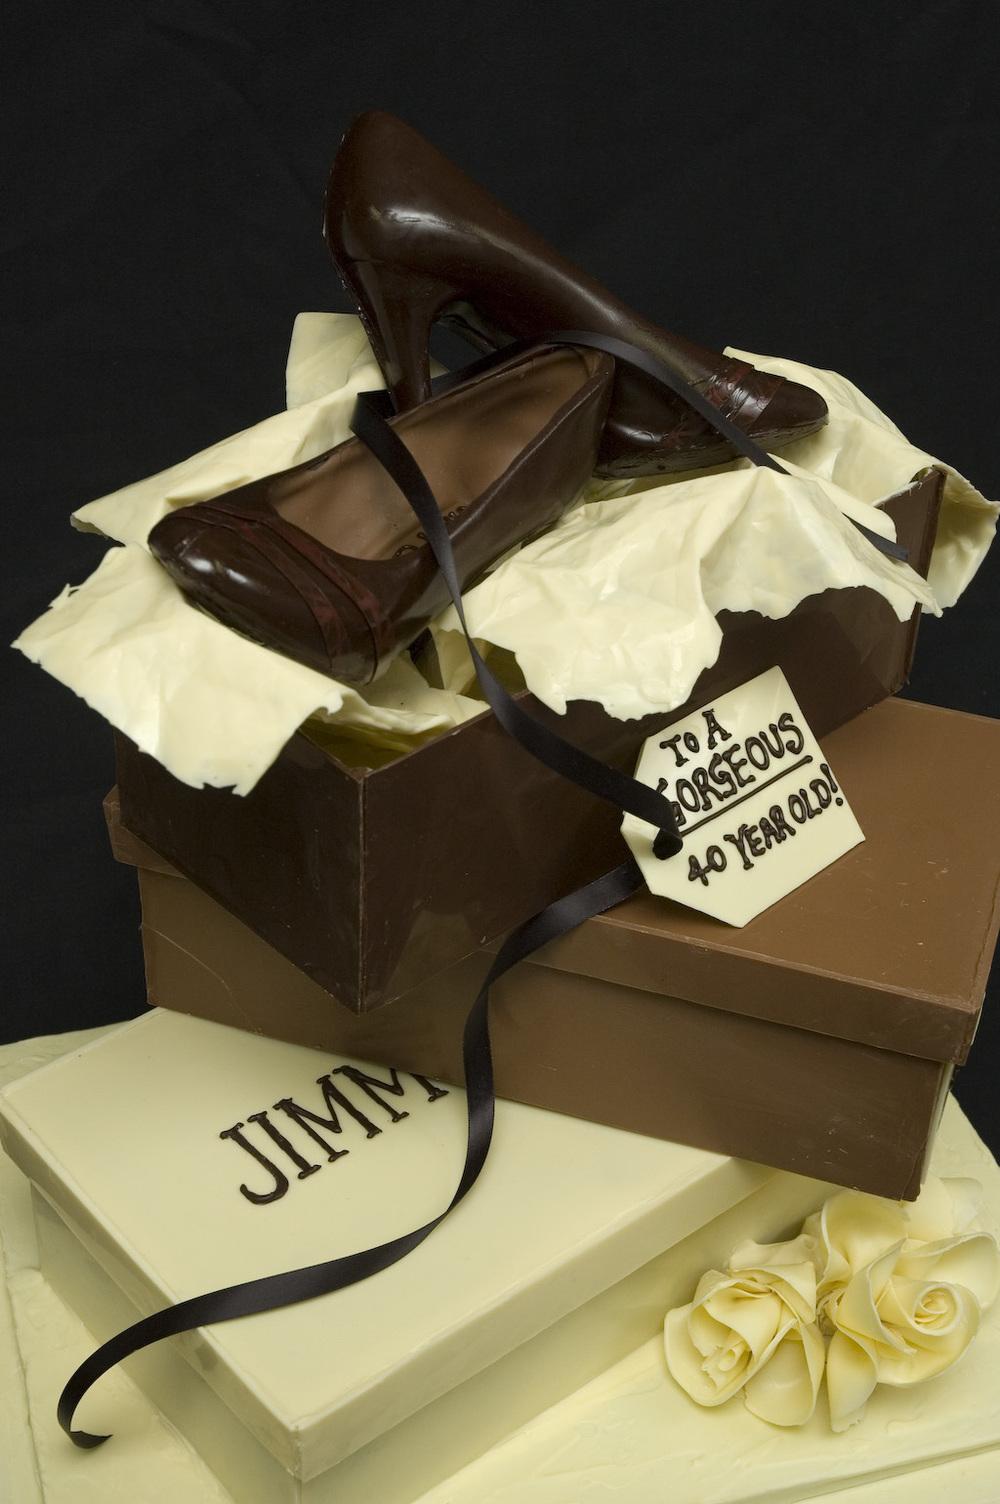 Jimmy Choo Cake sm 05.jpg